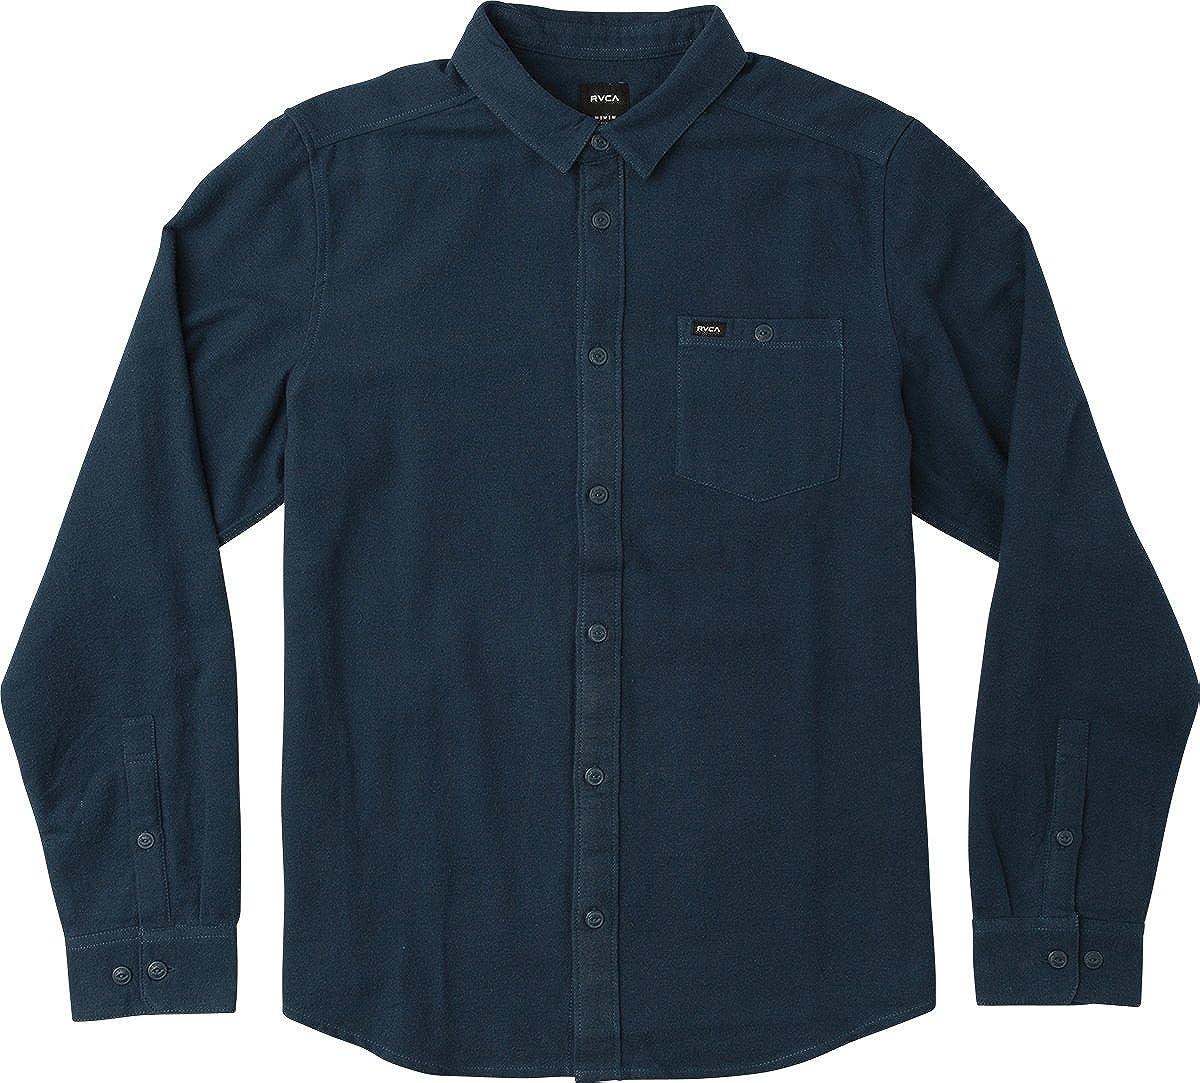 RVCA Mens Public Works Long Sleeve Woven Button Up Shirt